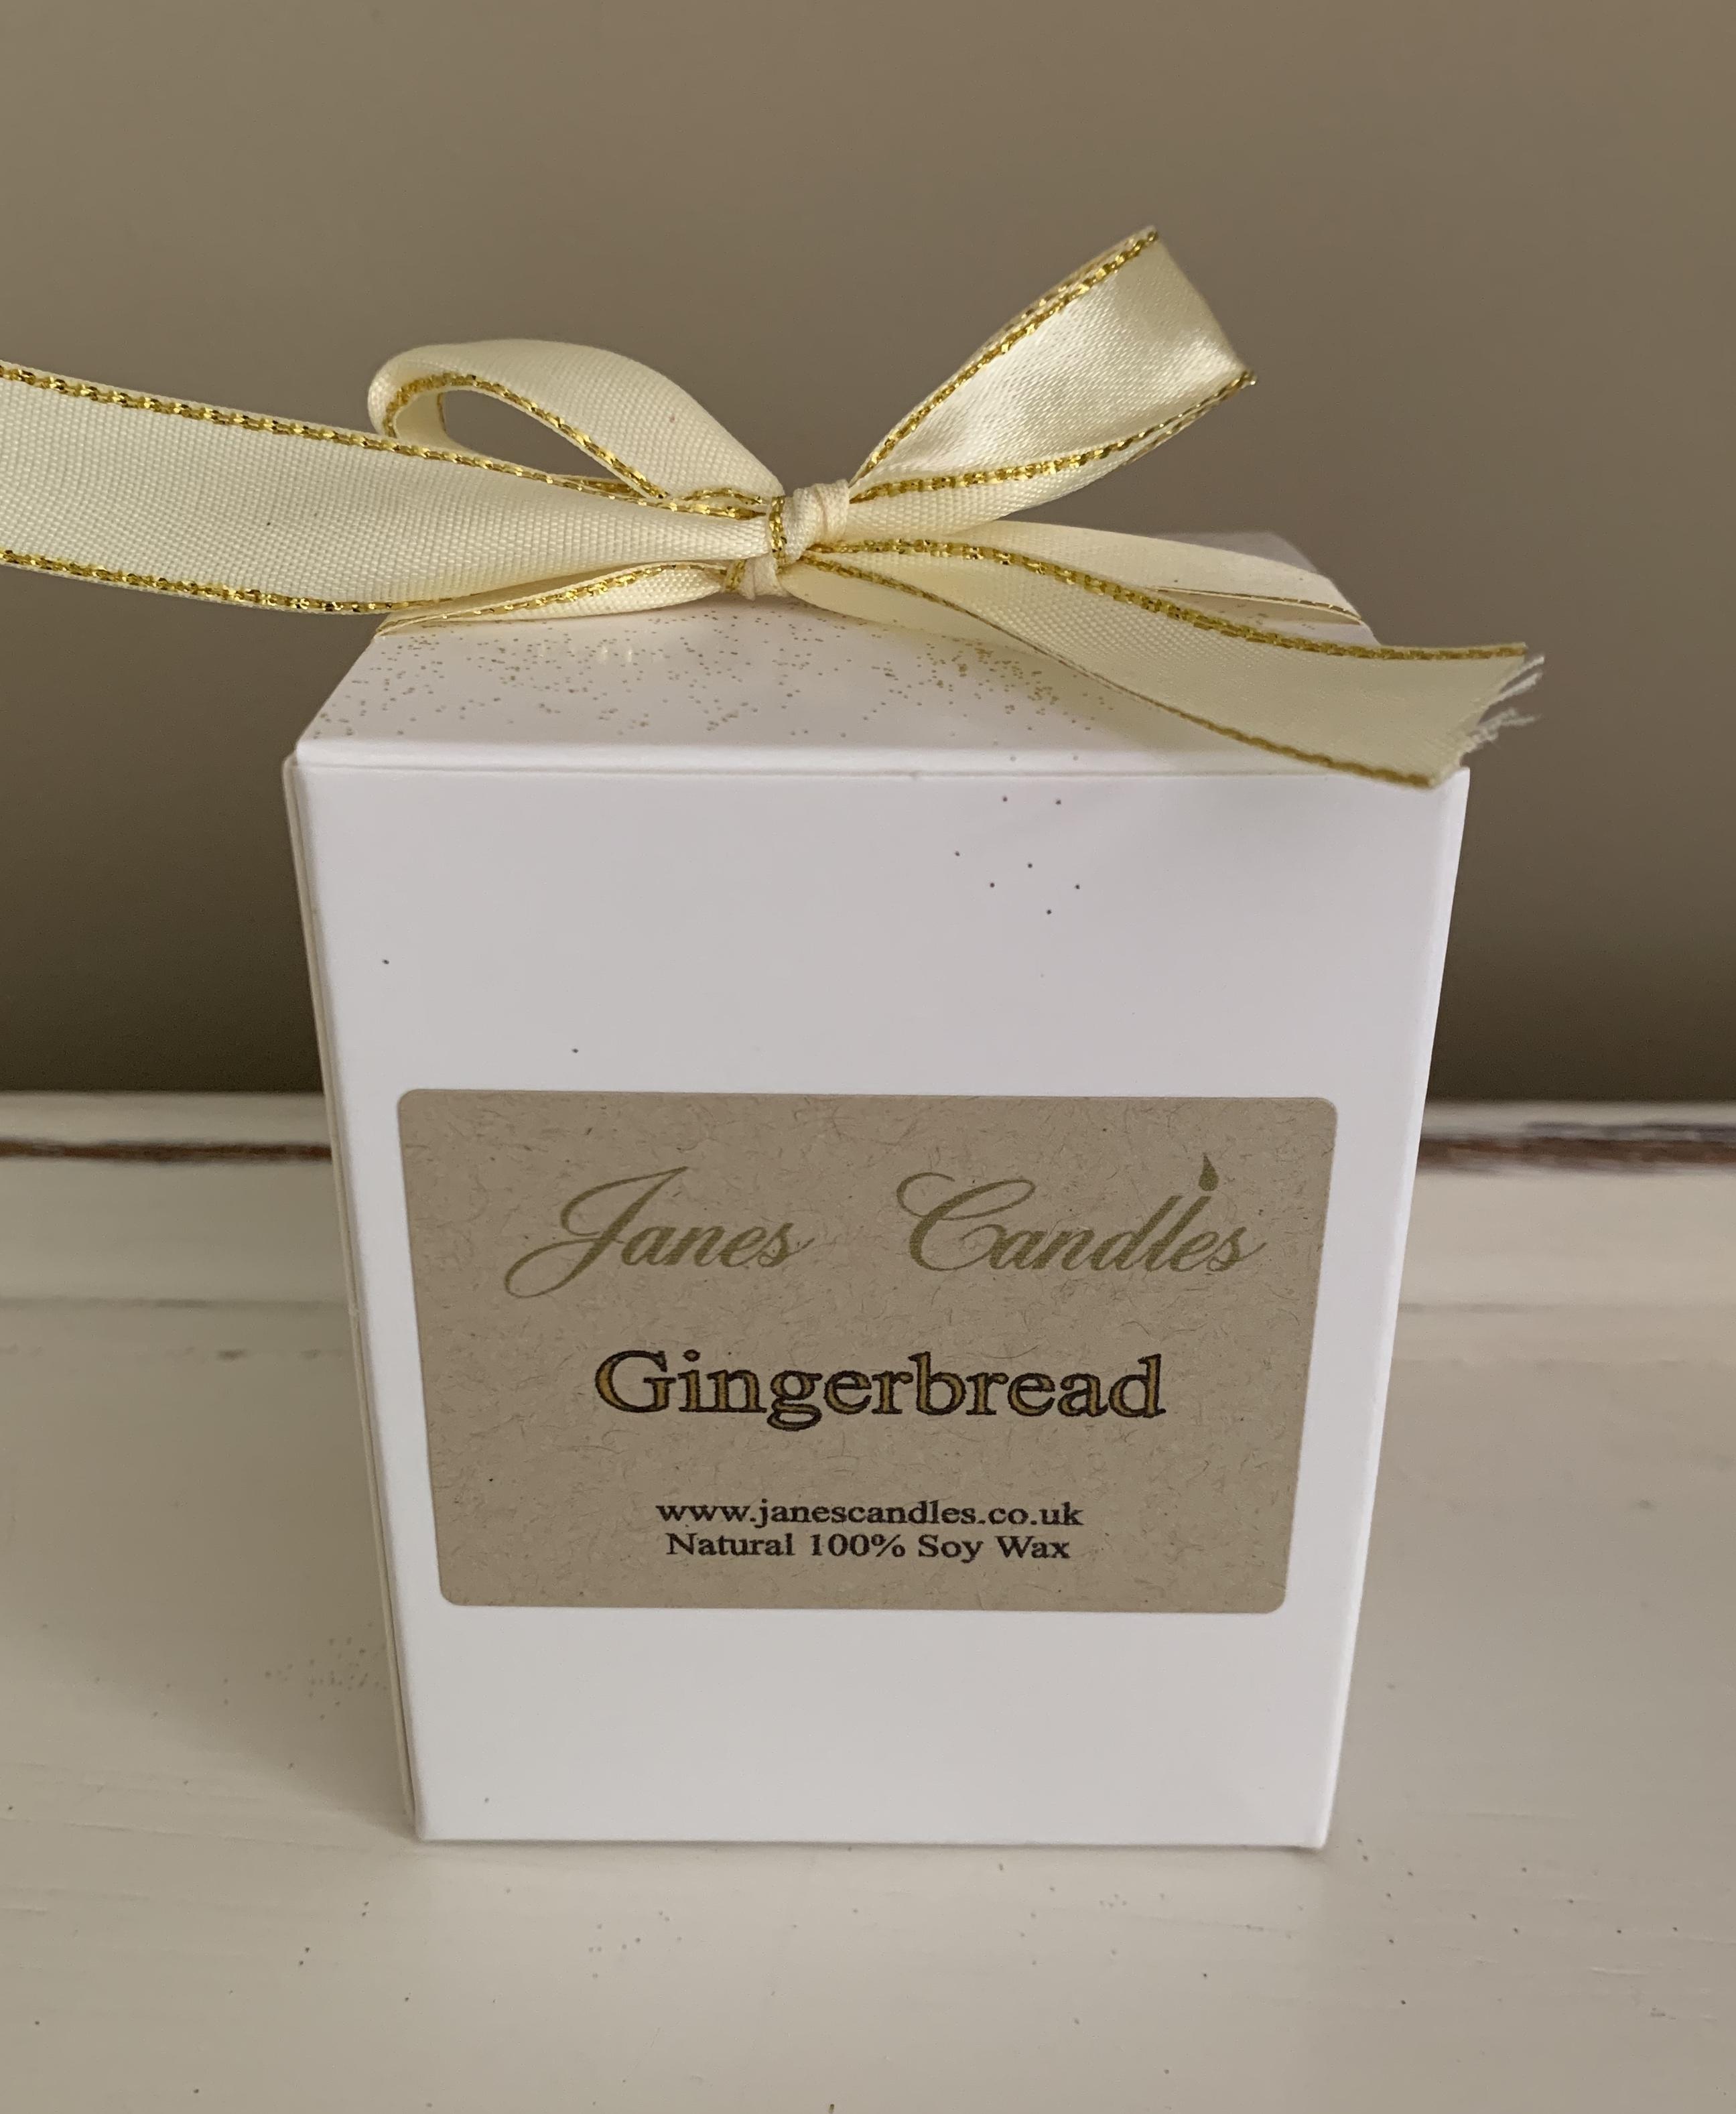 Gingerbread Jar Candle Packaging